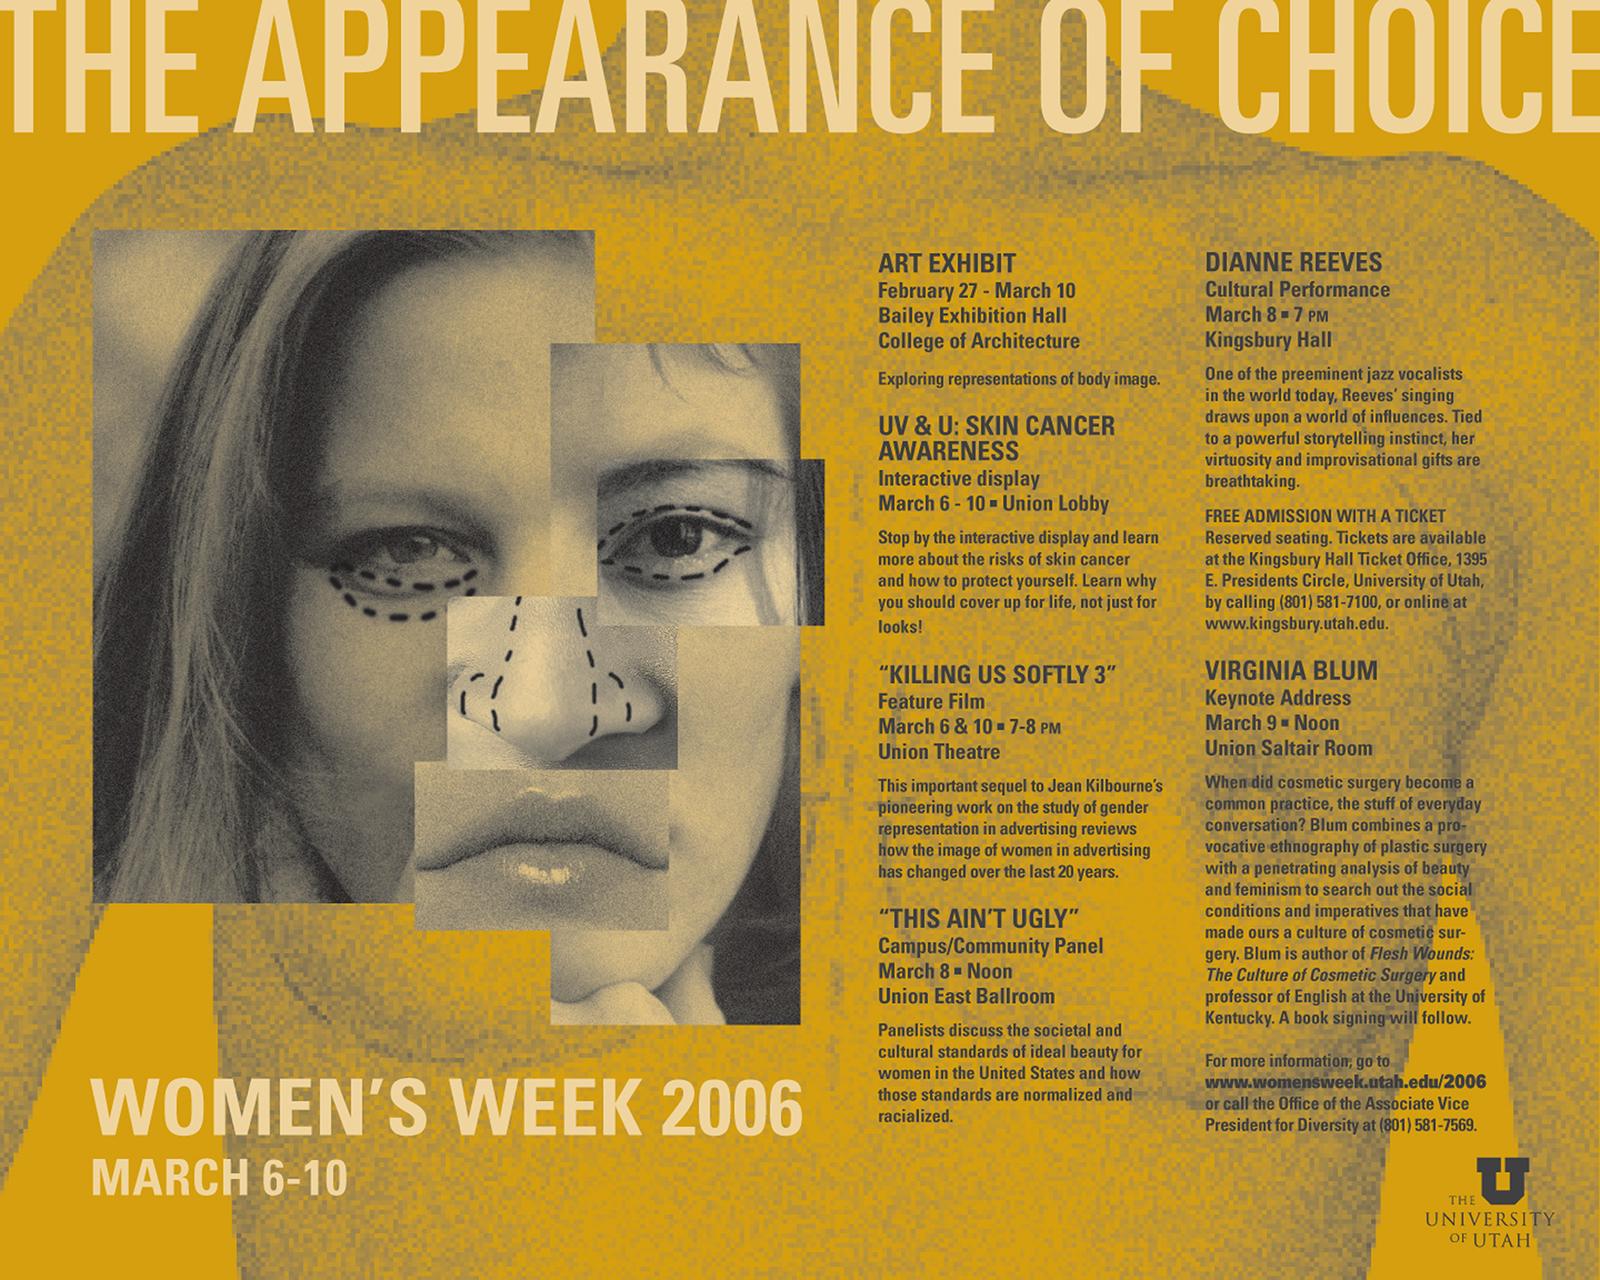 Women?s Week 2006 Poster